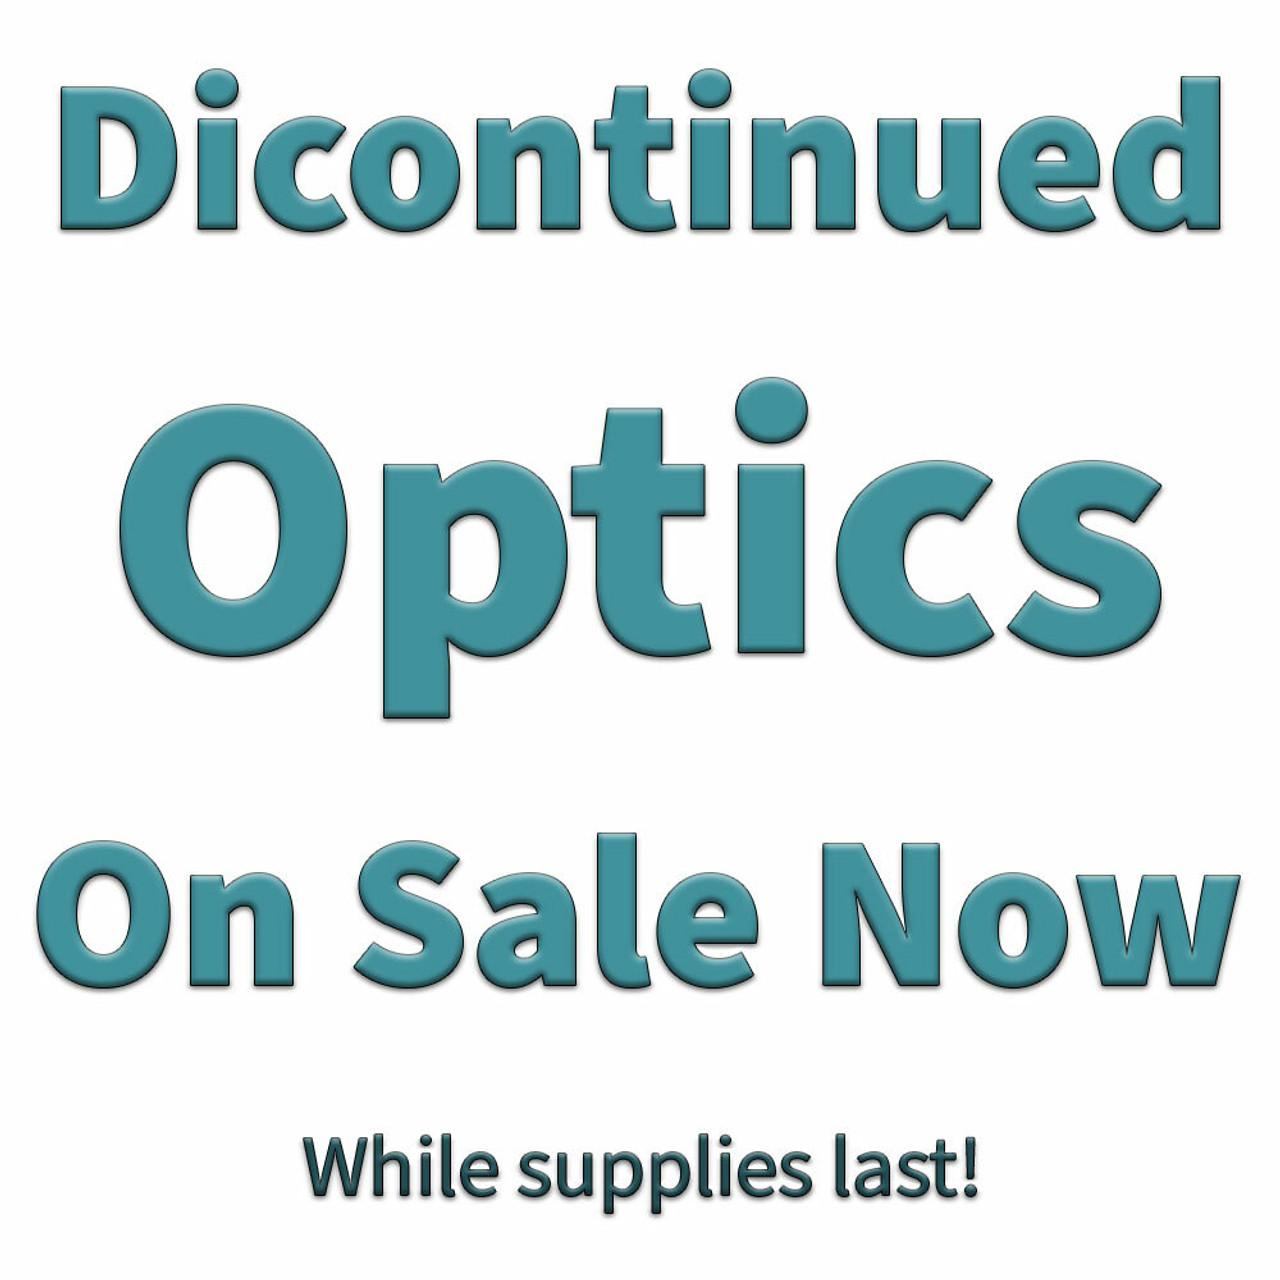 Discontinued Optics